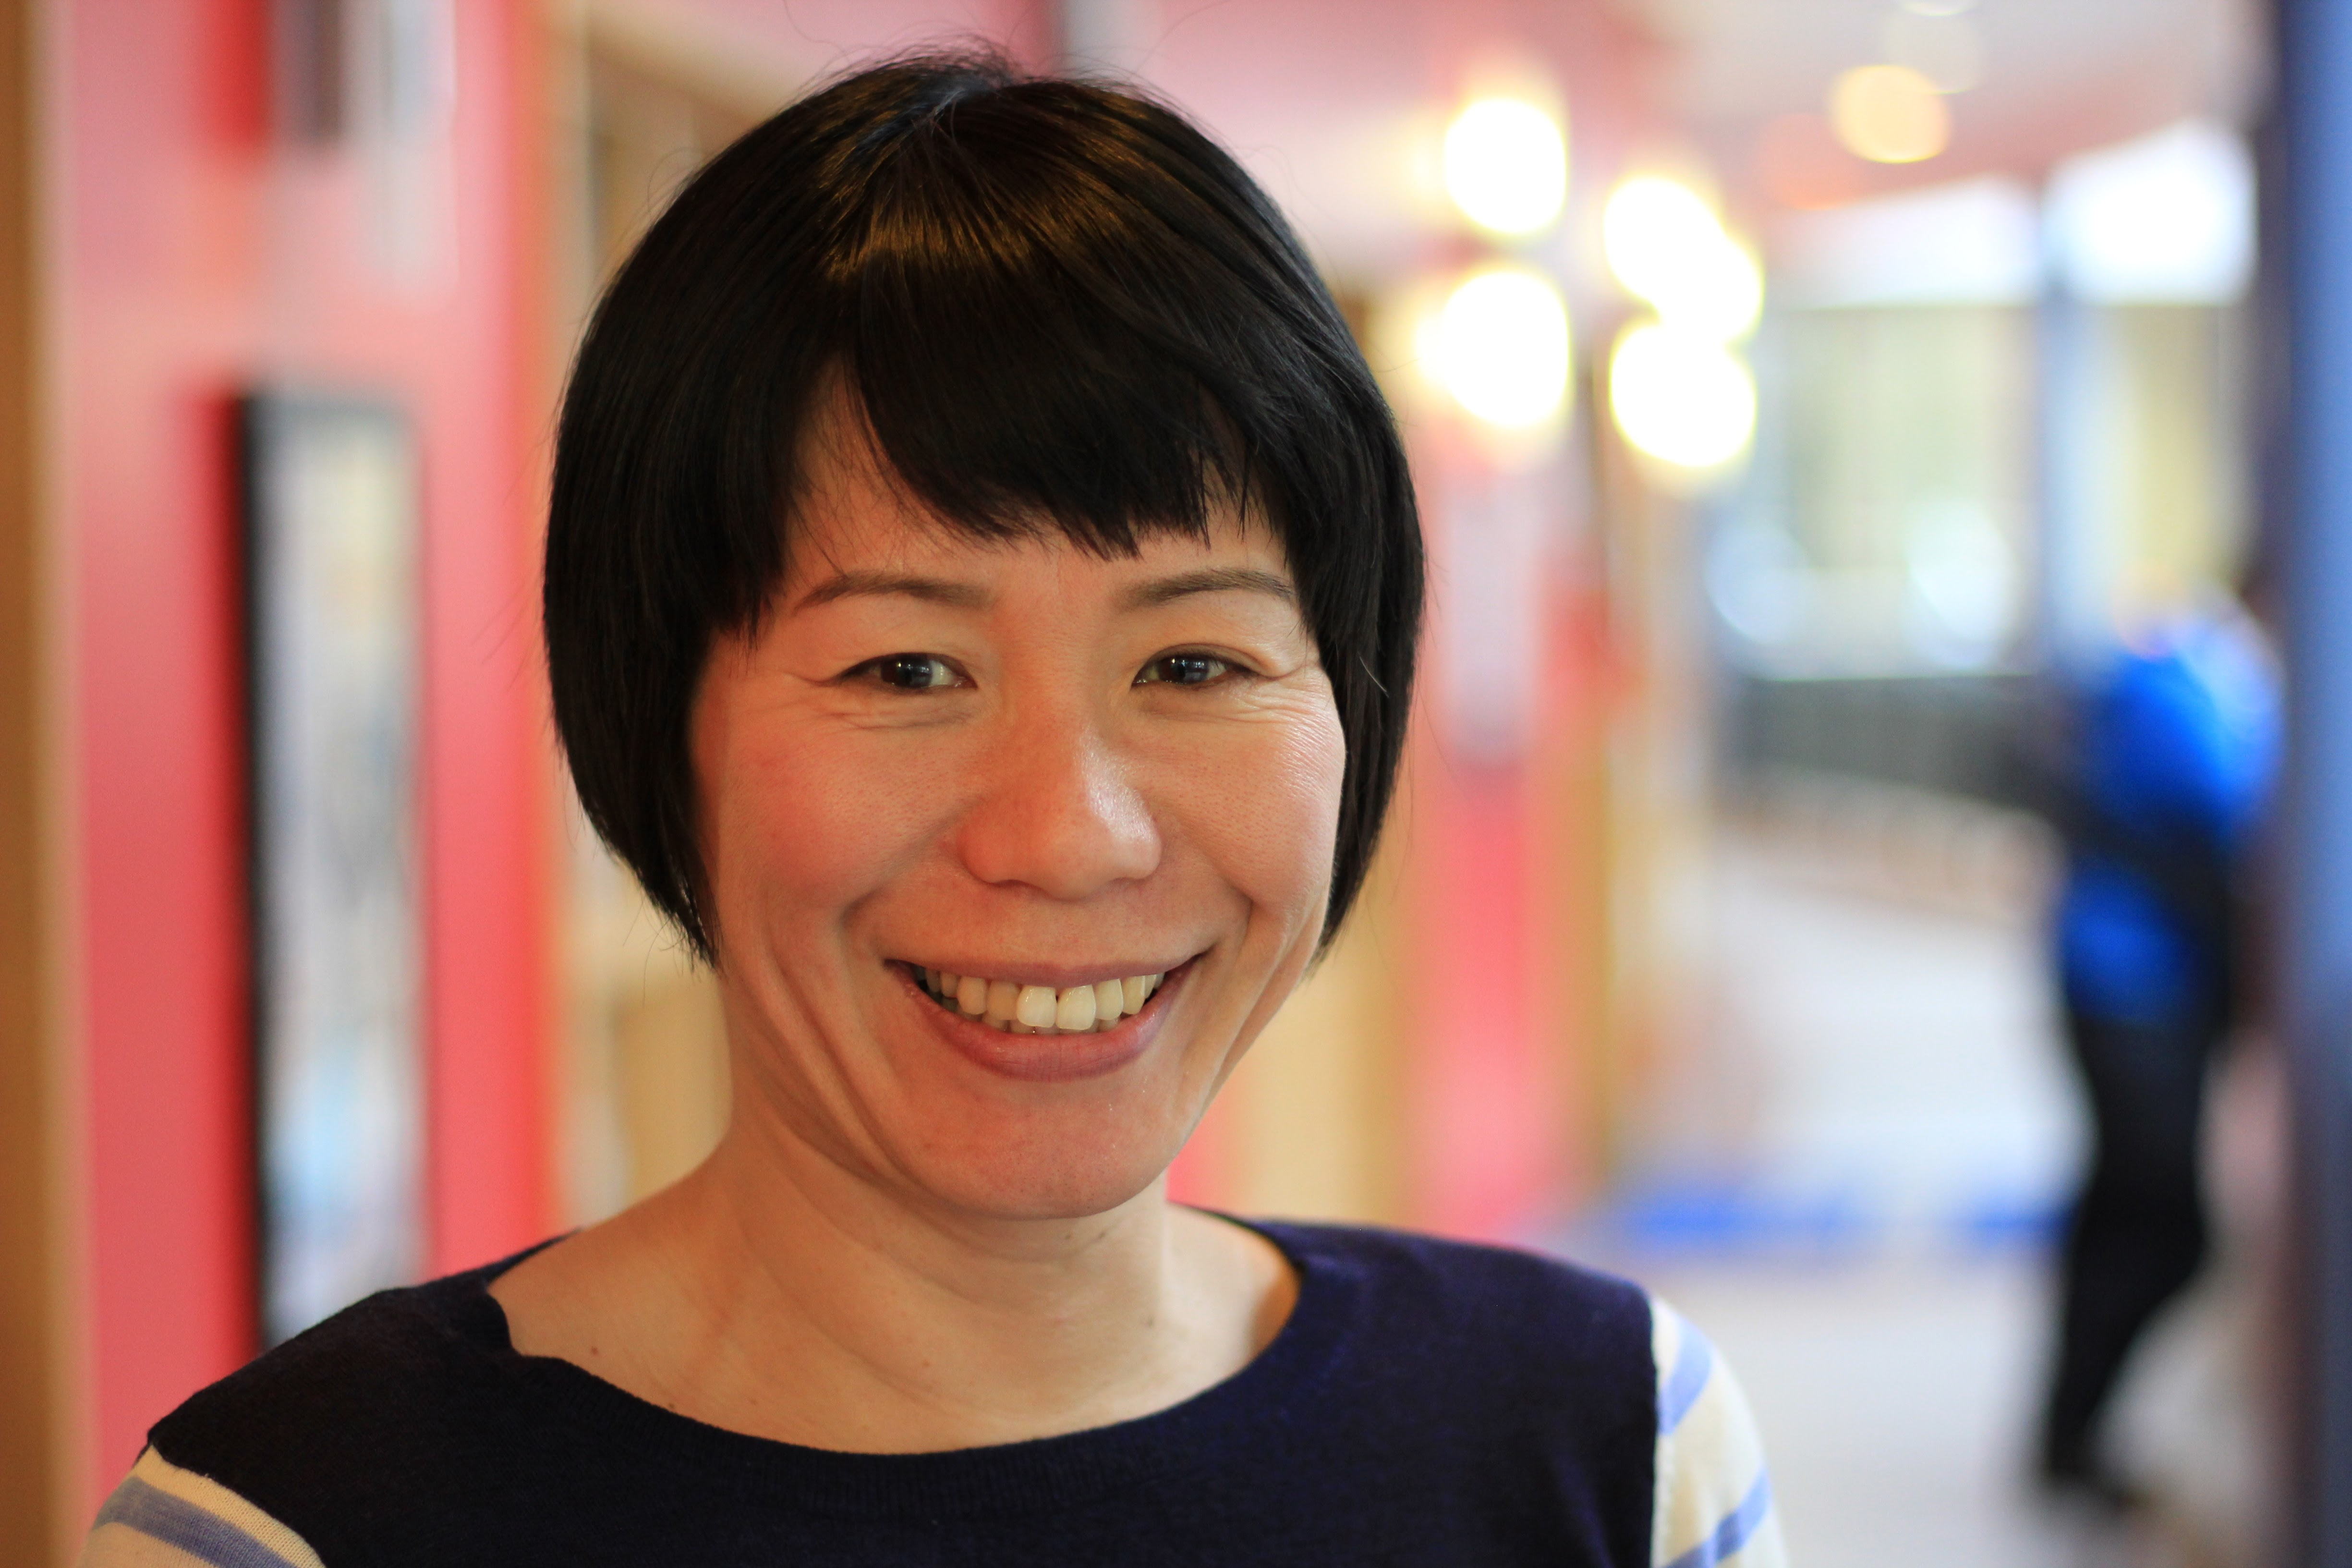 DCU language services - Shima Yamanaka